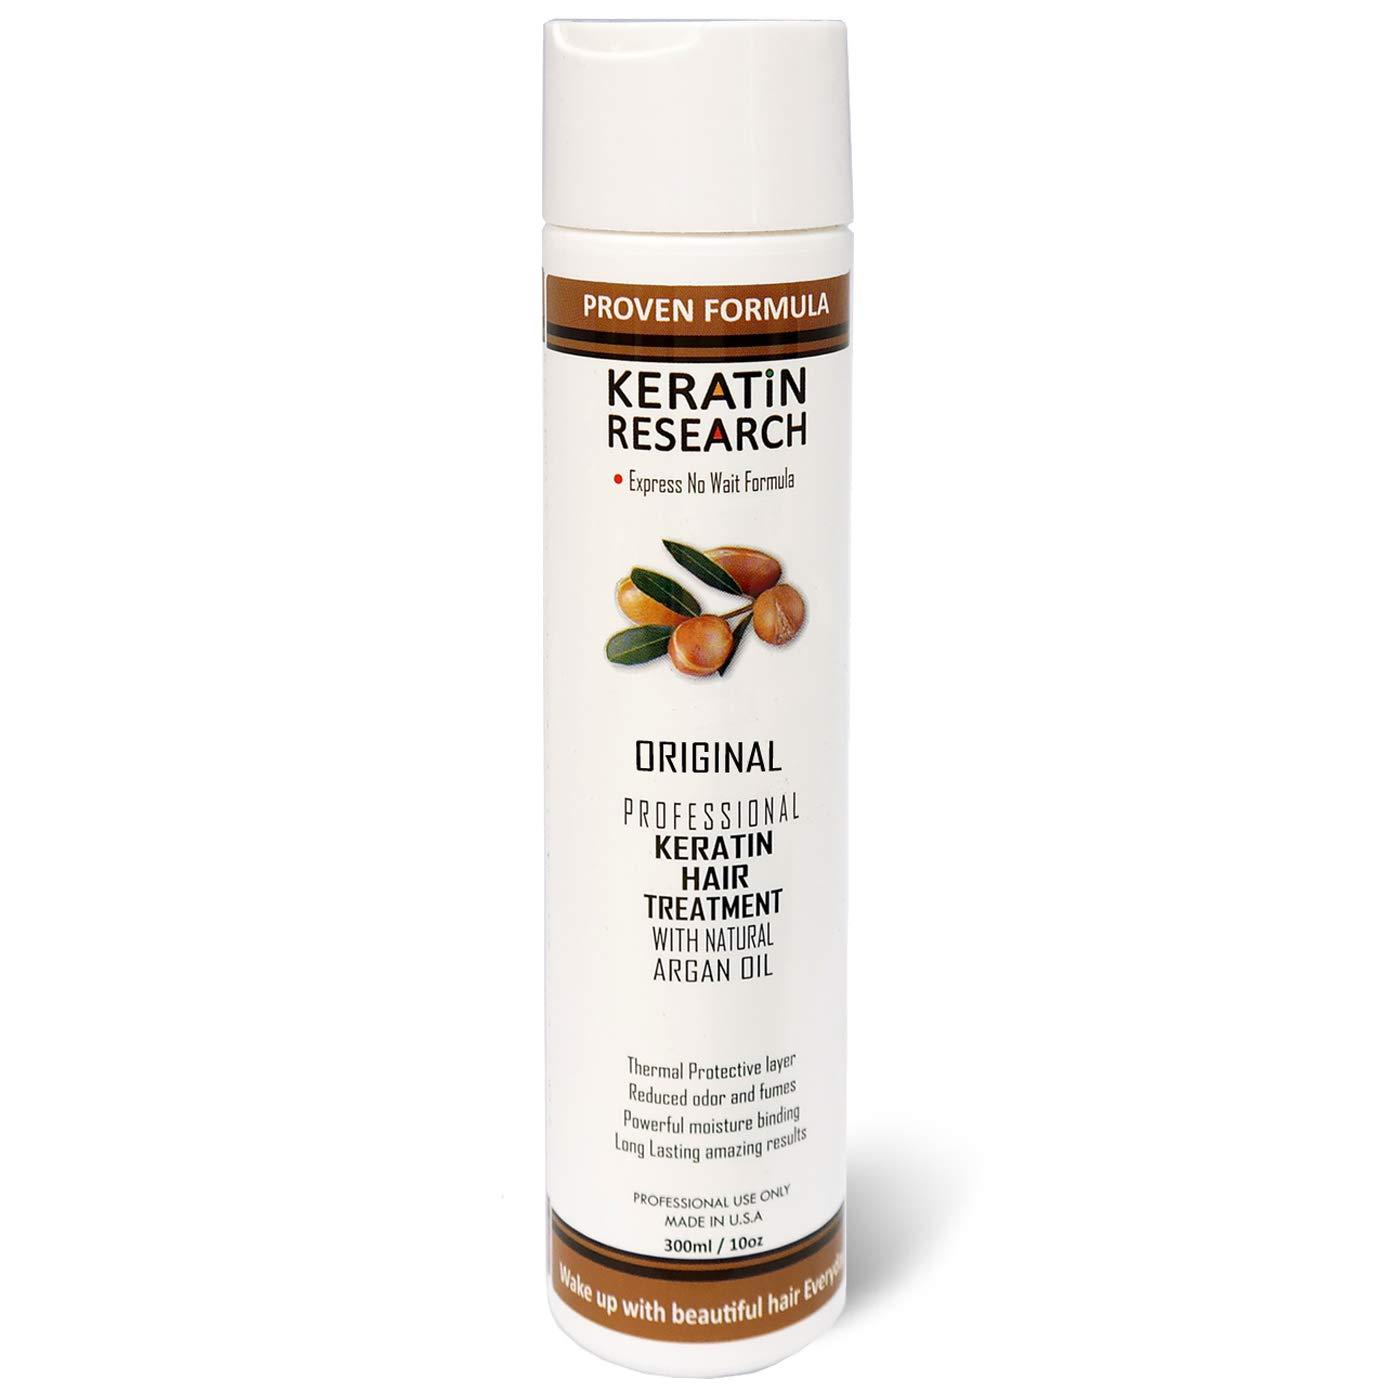 Brazilian Keratin Hair Treatment 300ml Professional Complex Blowout with Argan Oil Improved Formula and Fragrance Keratin Research Queratina Keratina Brasilera Tratamiento by KERATIN RESEARCH